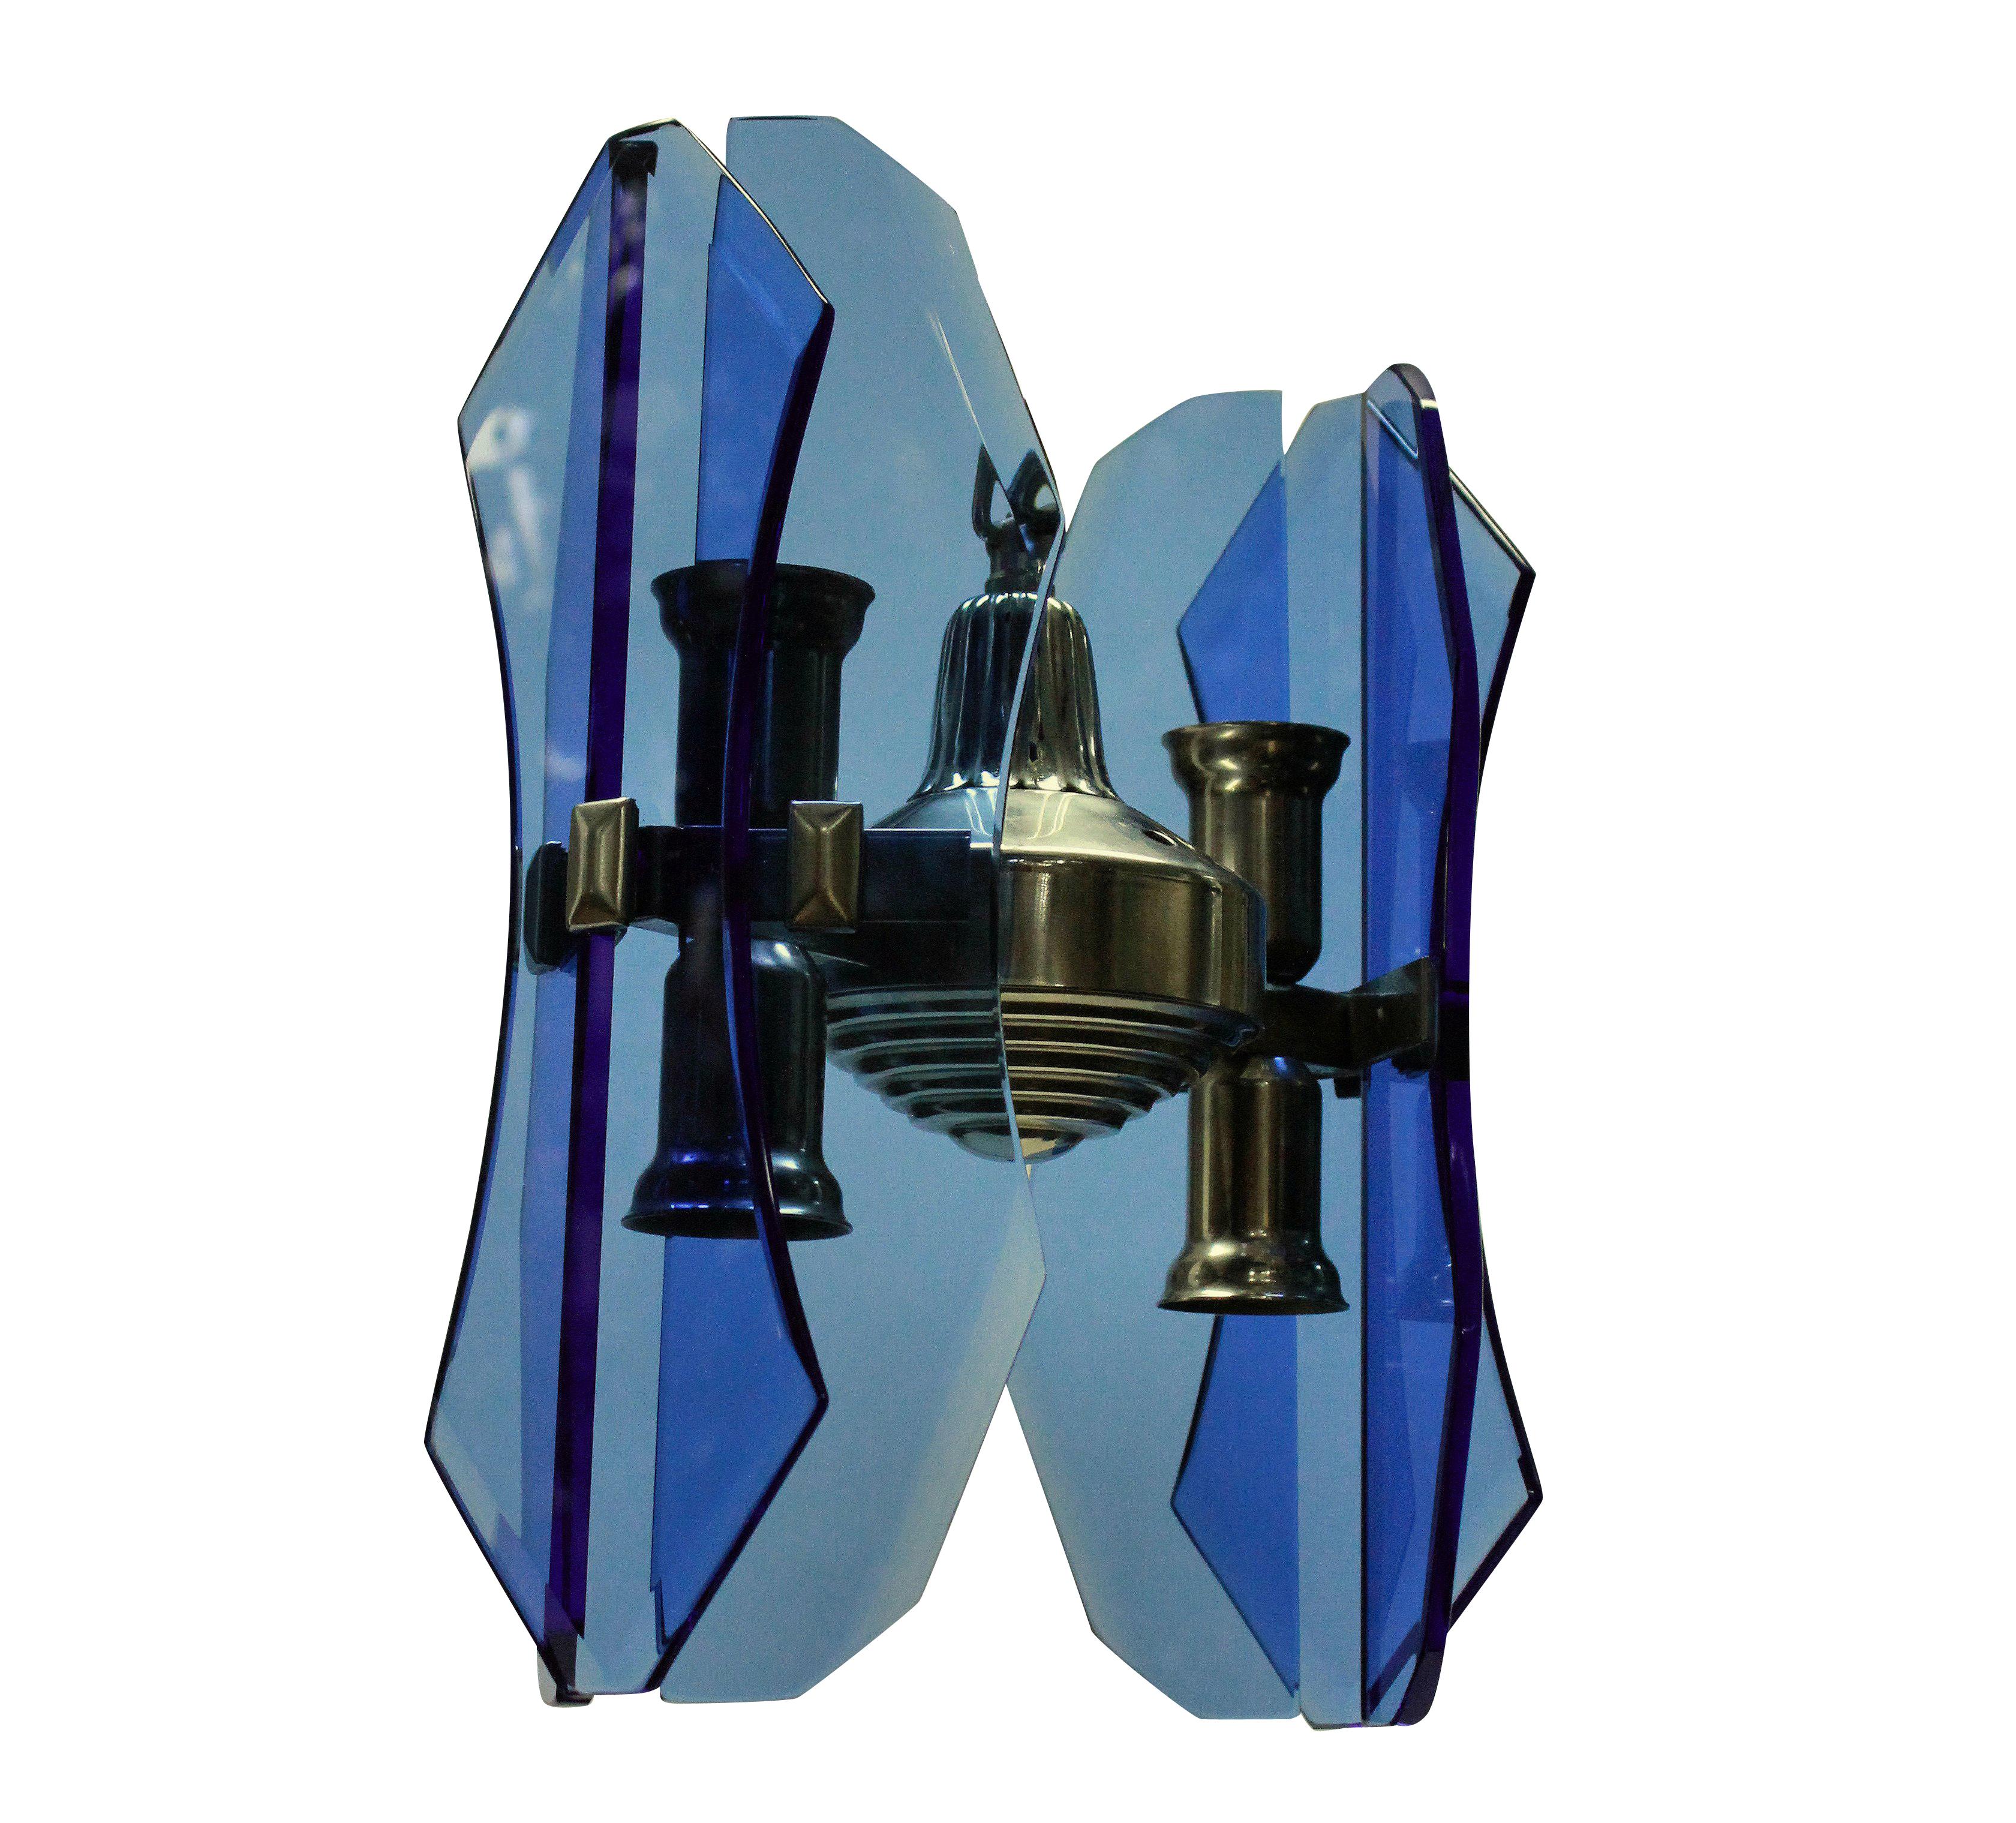 A SMALL VECA PENDANT LIGHT IN BLUE GLASS